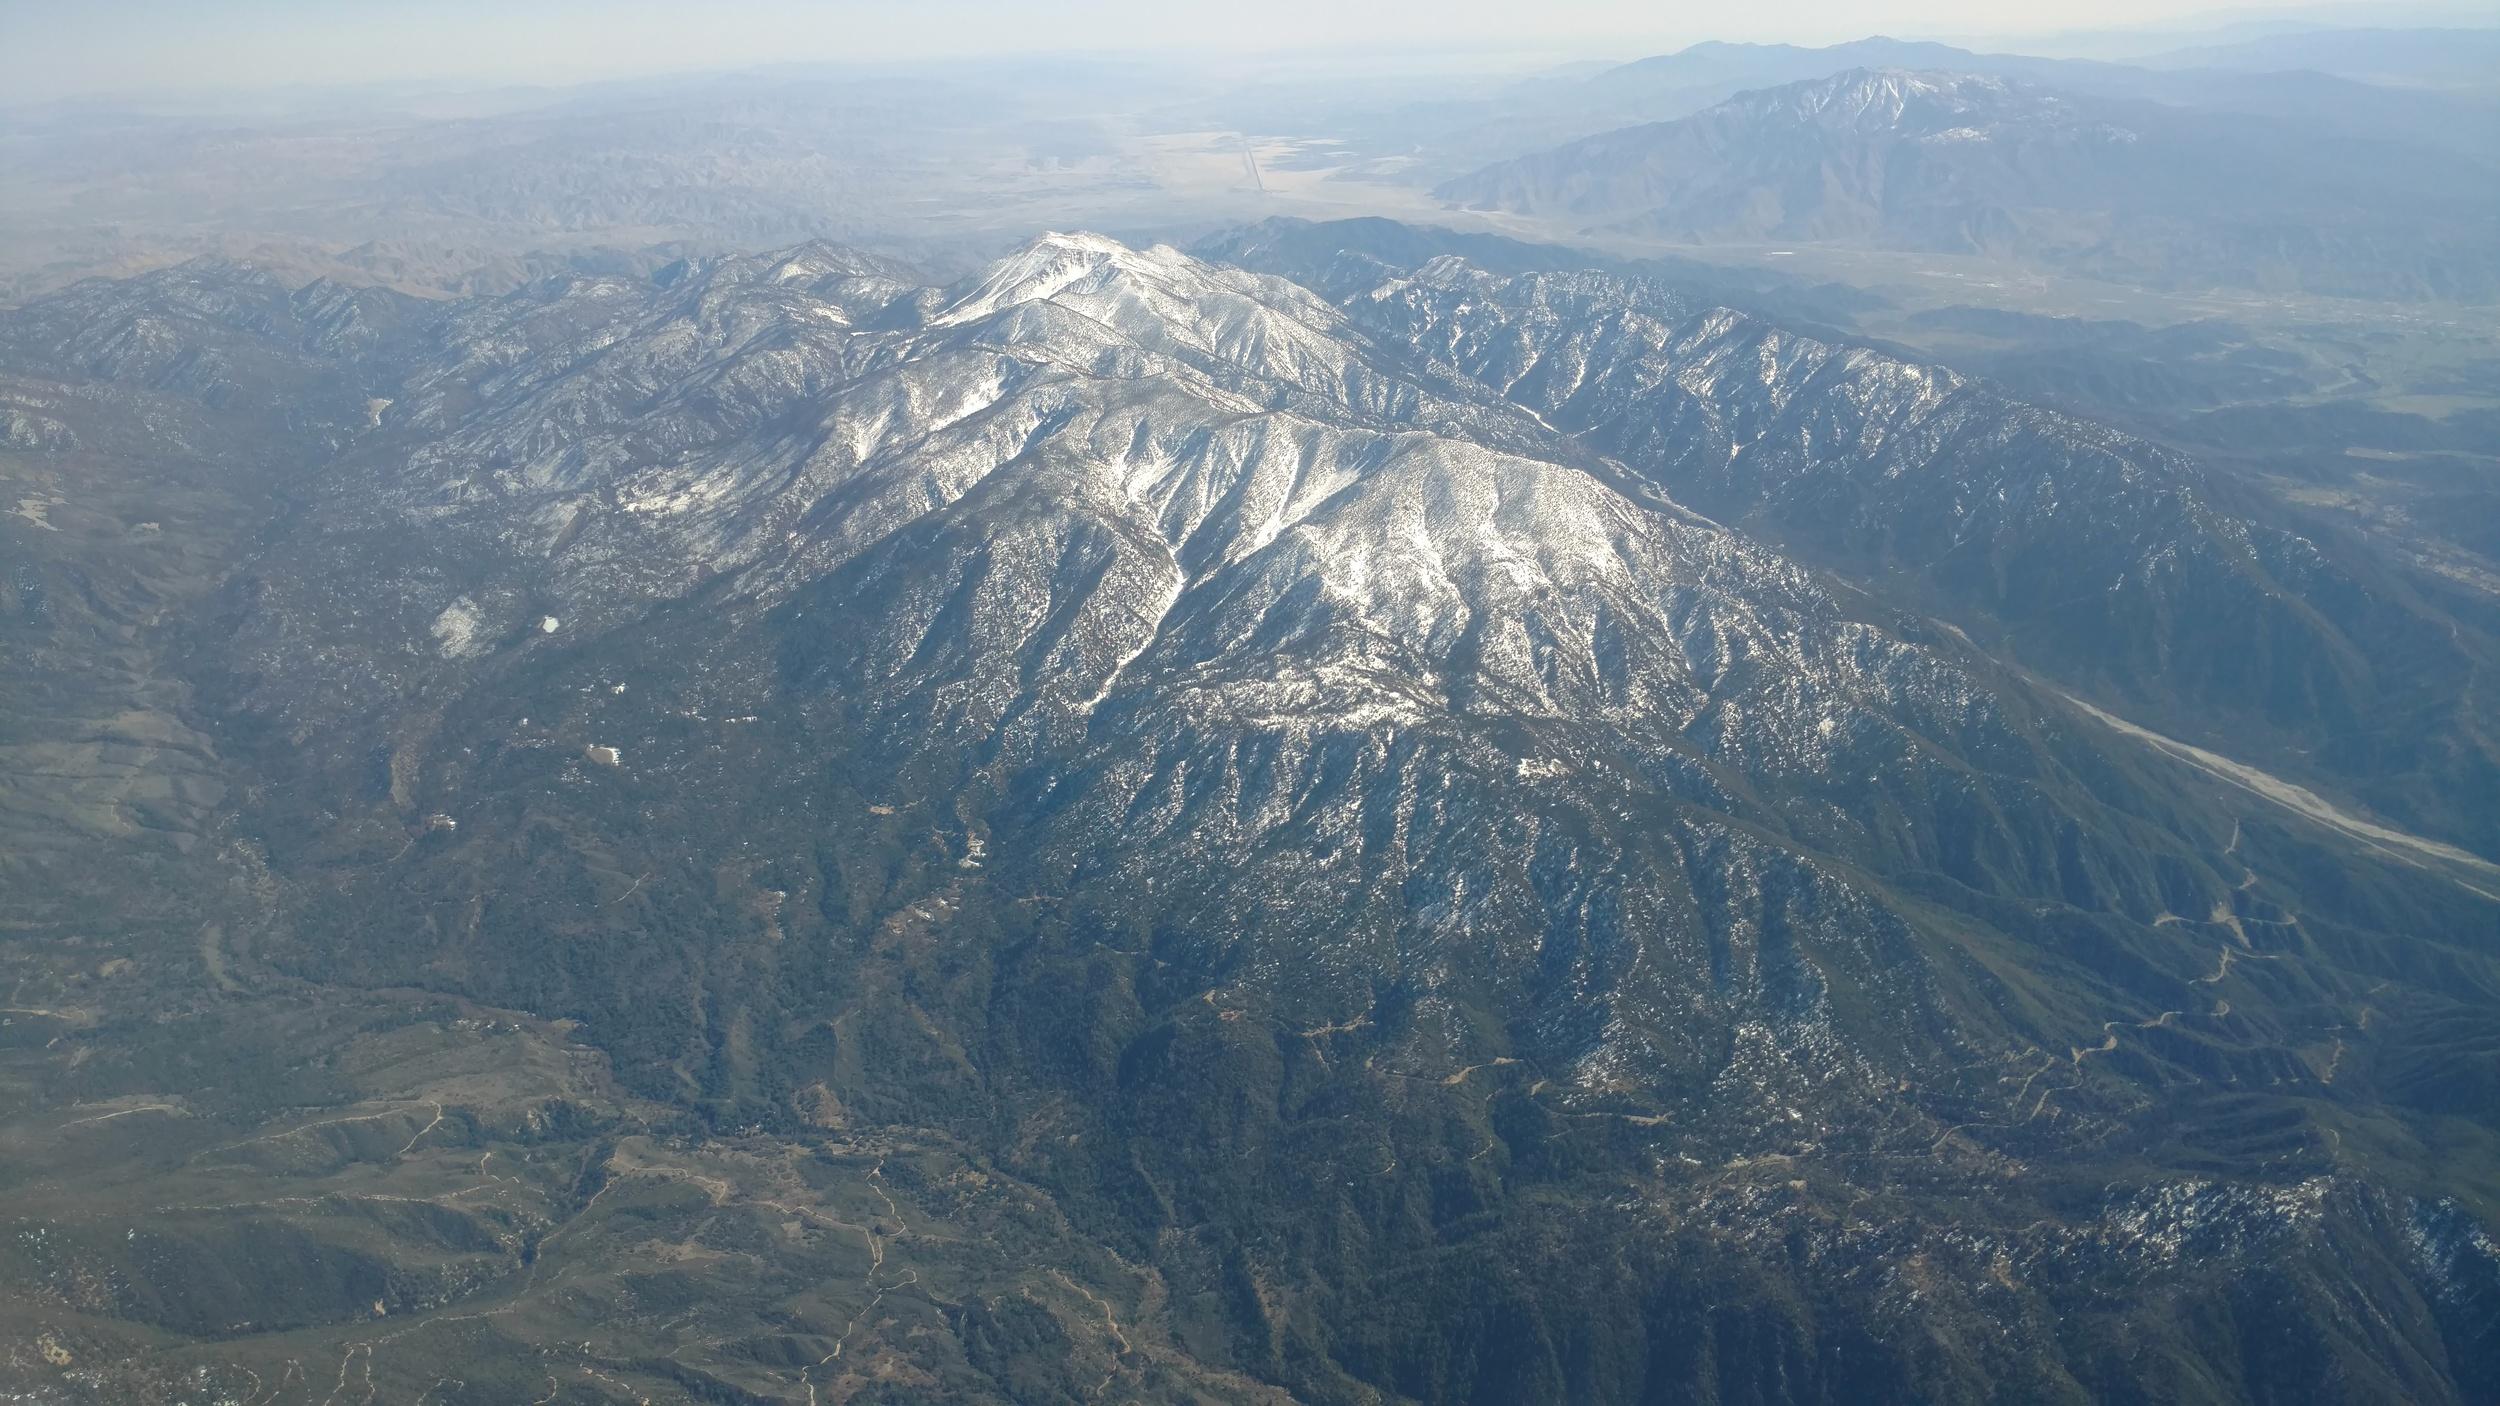 Mount (No Name)